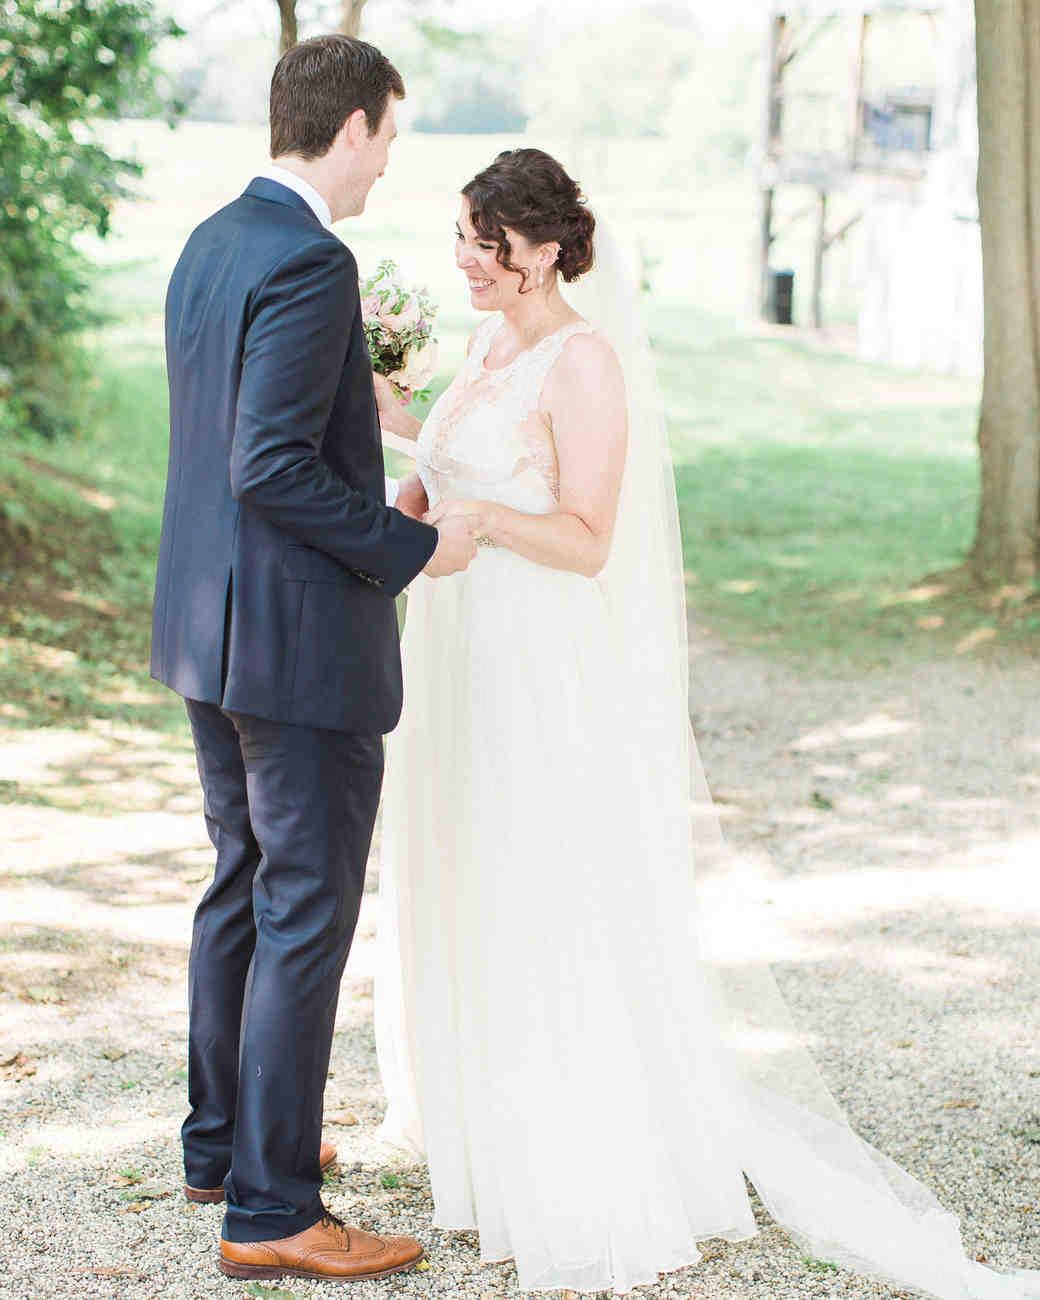 sarah-michael-wedding-firstlook-200-s112783-0416.jpg